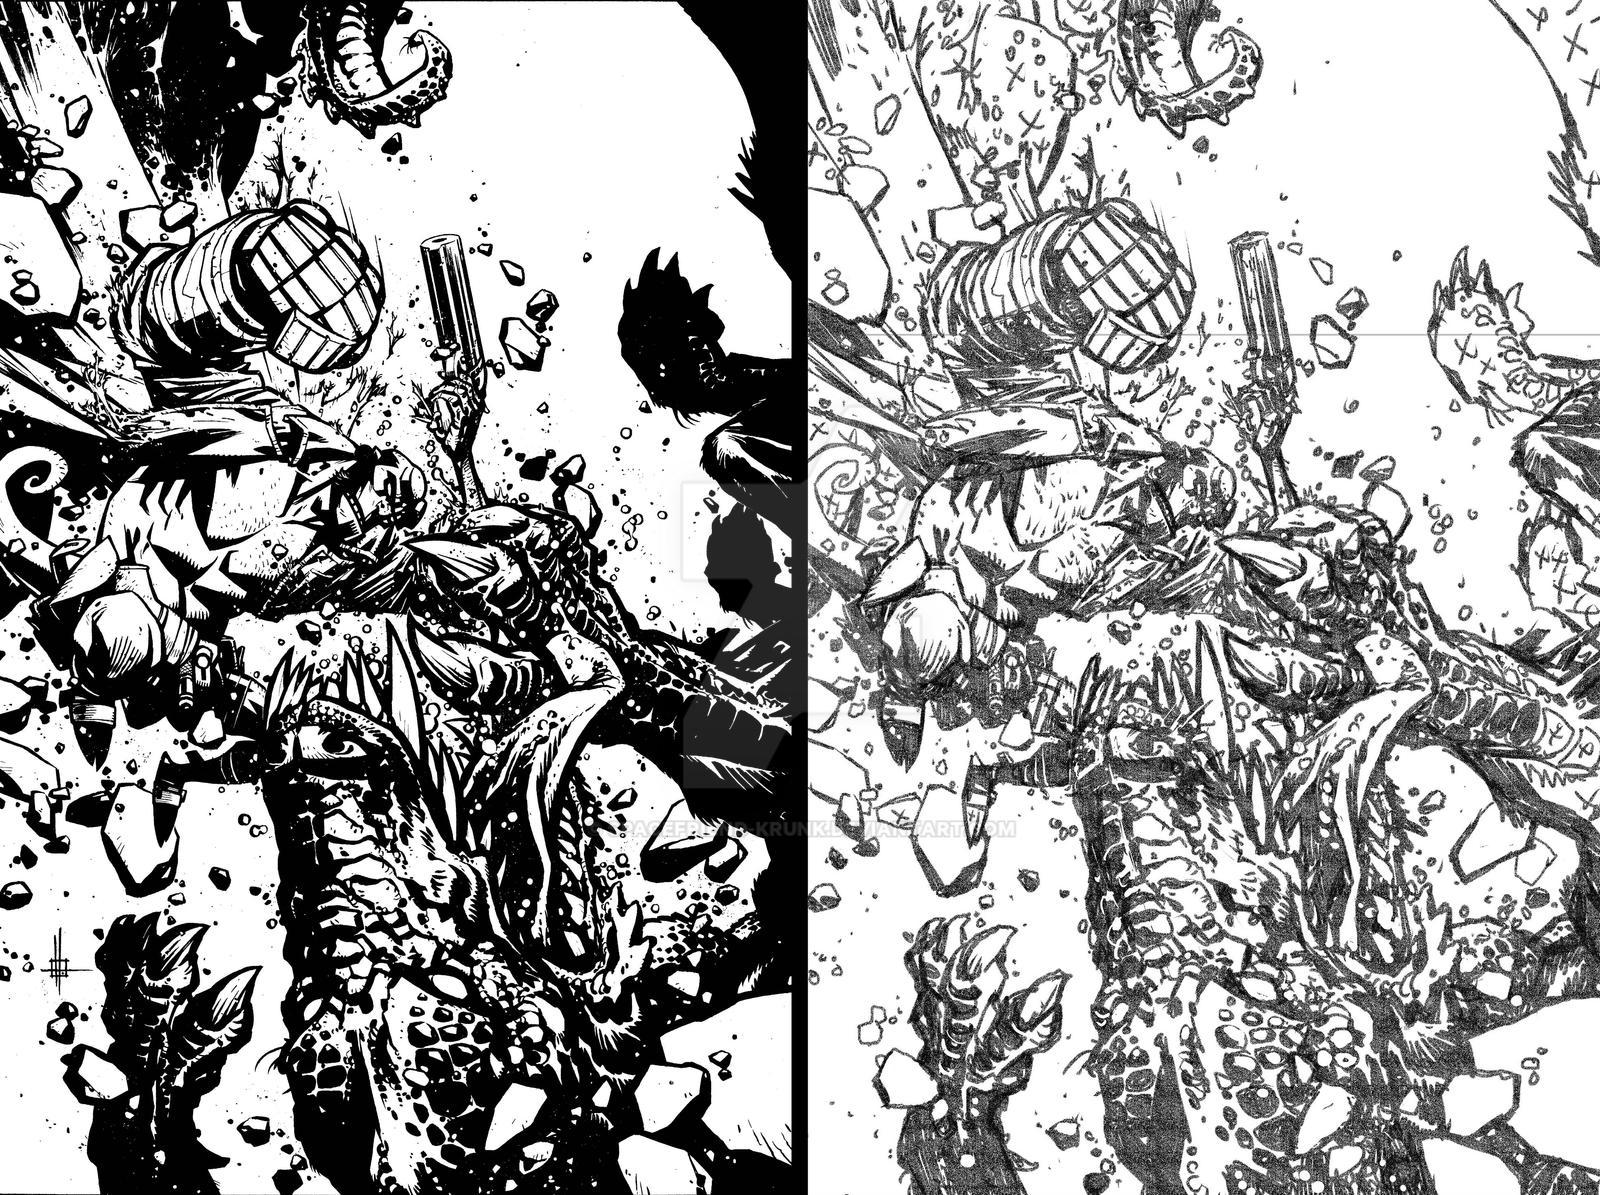 Hellboy The Return of Effie Kolb Issue 2 Cover